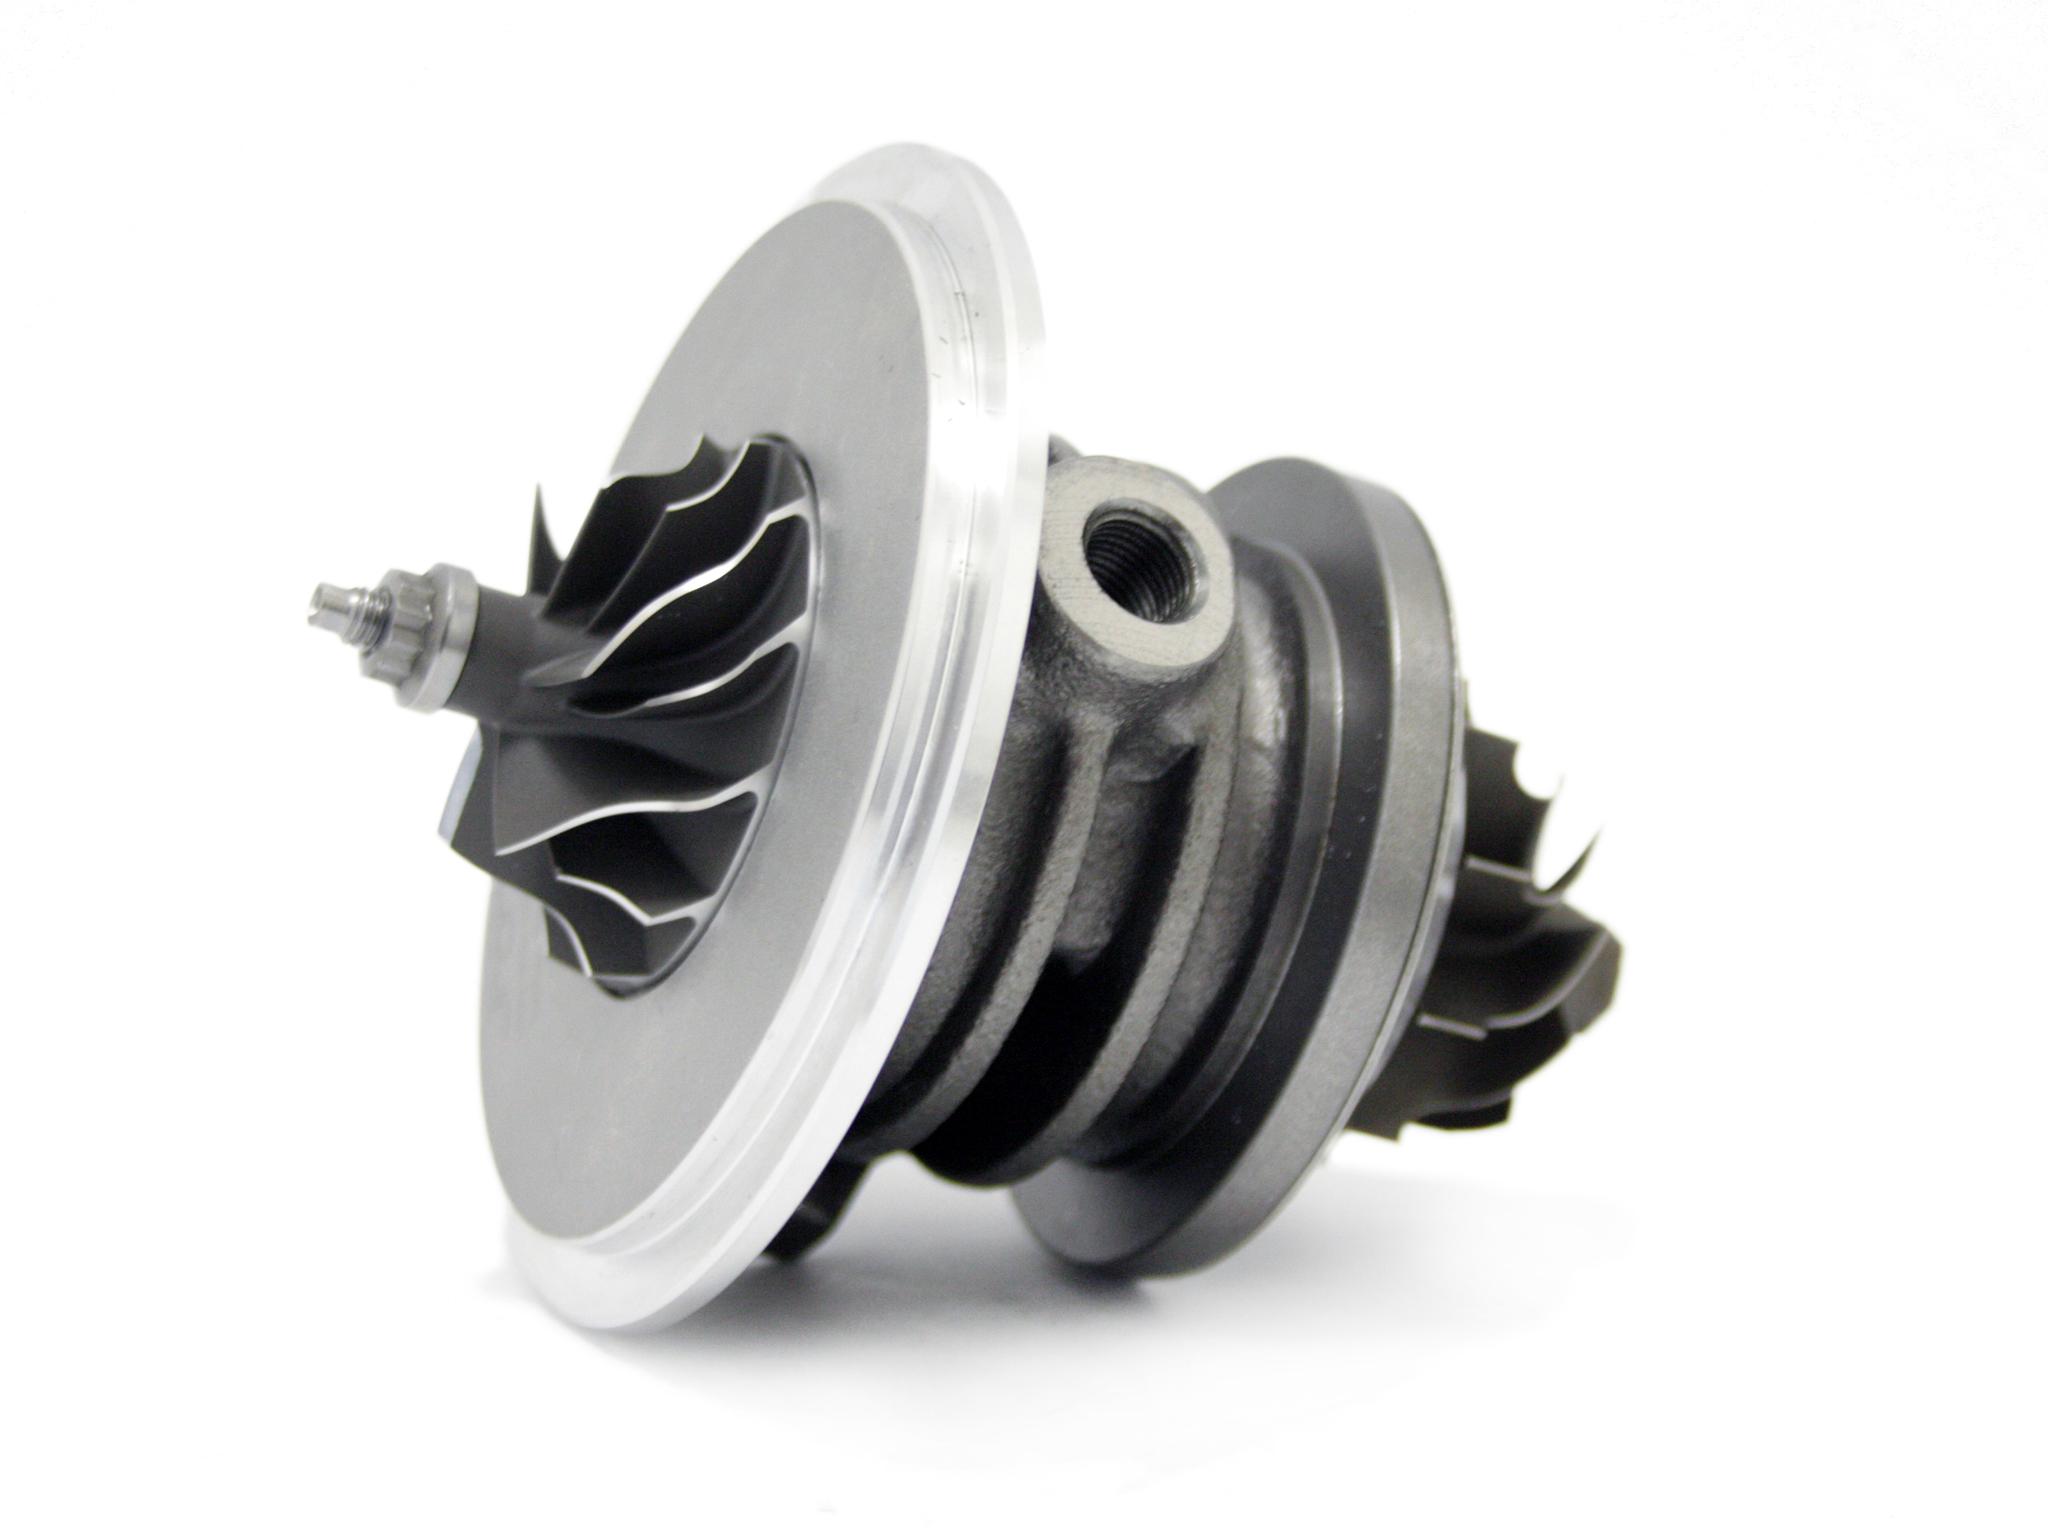 Картридж турбины GT1544S Фольксваген 1,9 TDI 1Z / AHU / ALE 90 л.с.